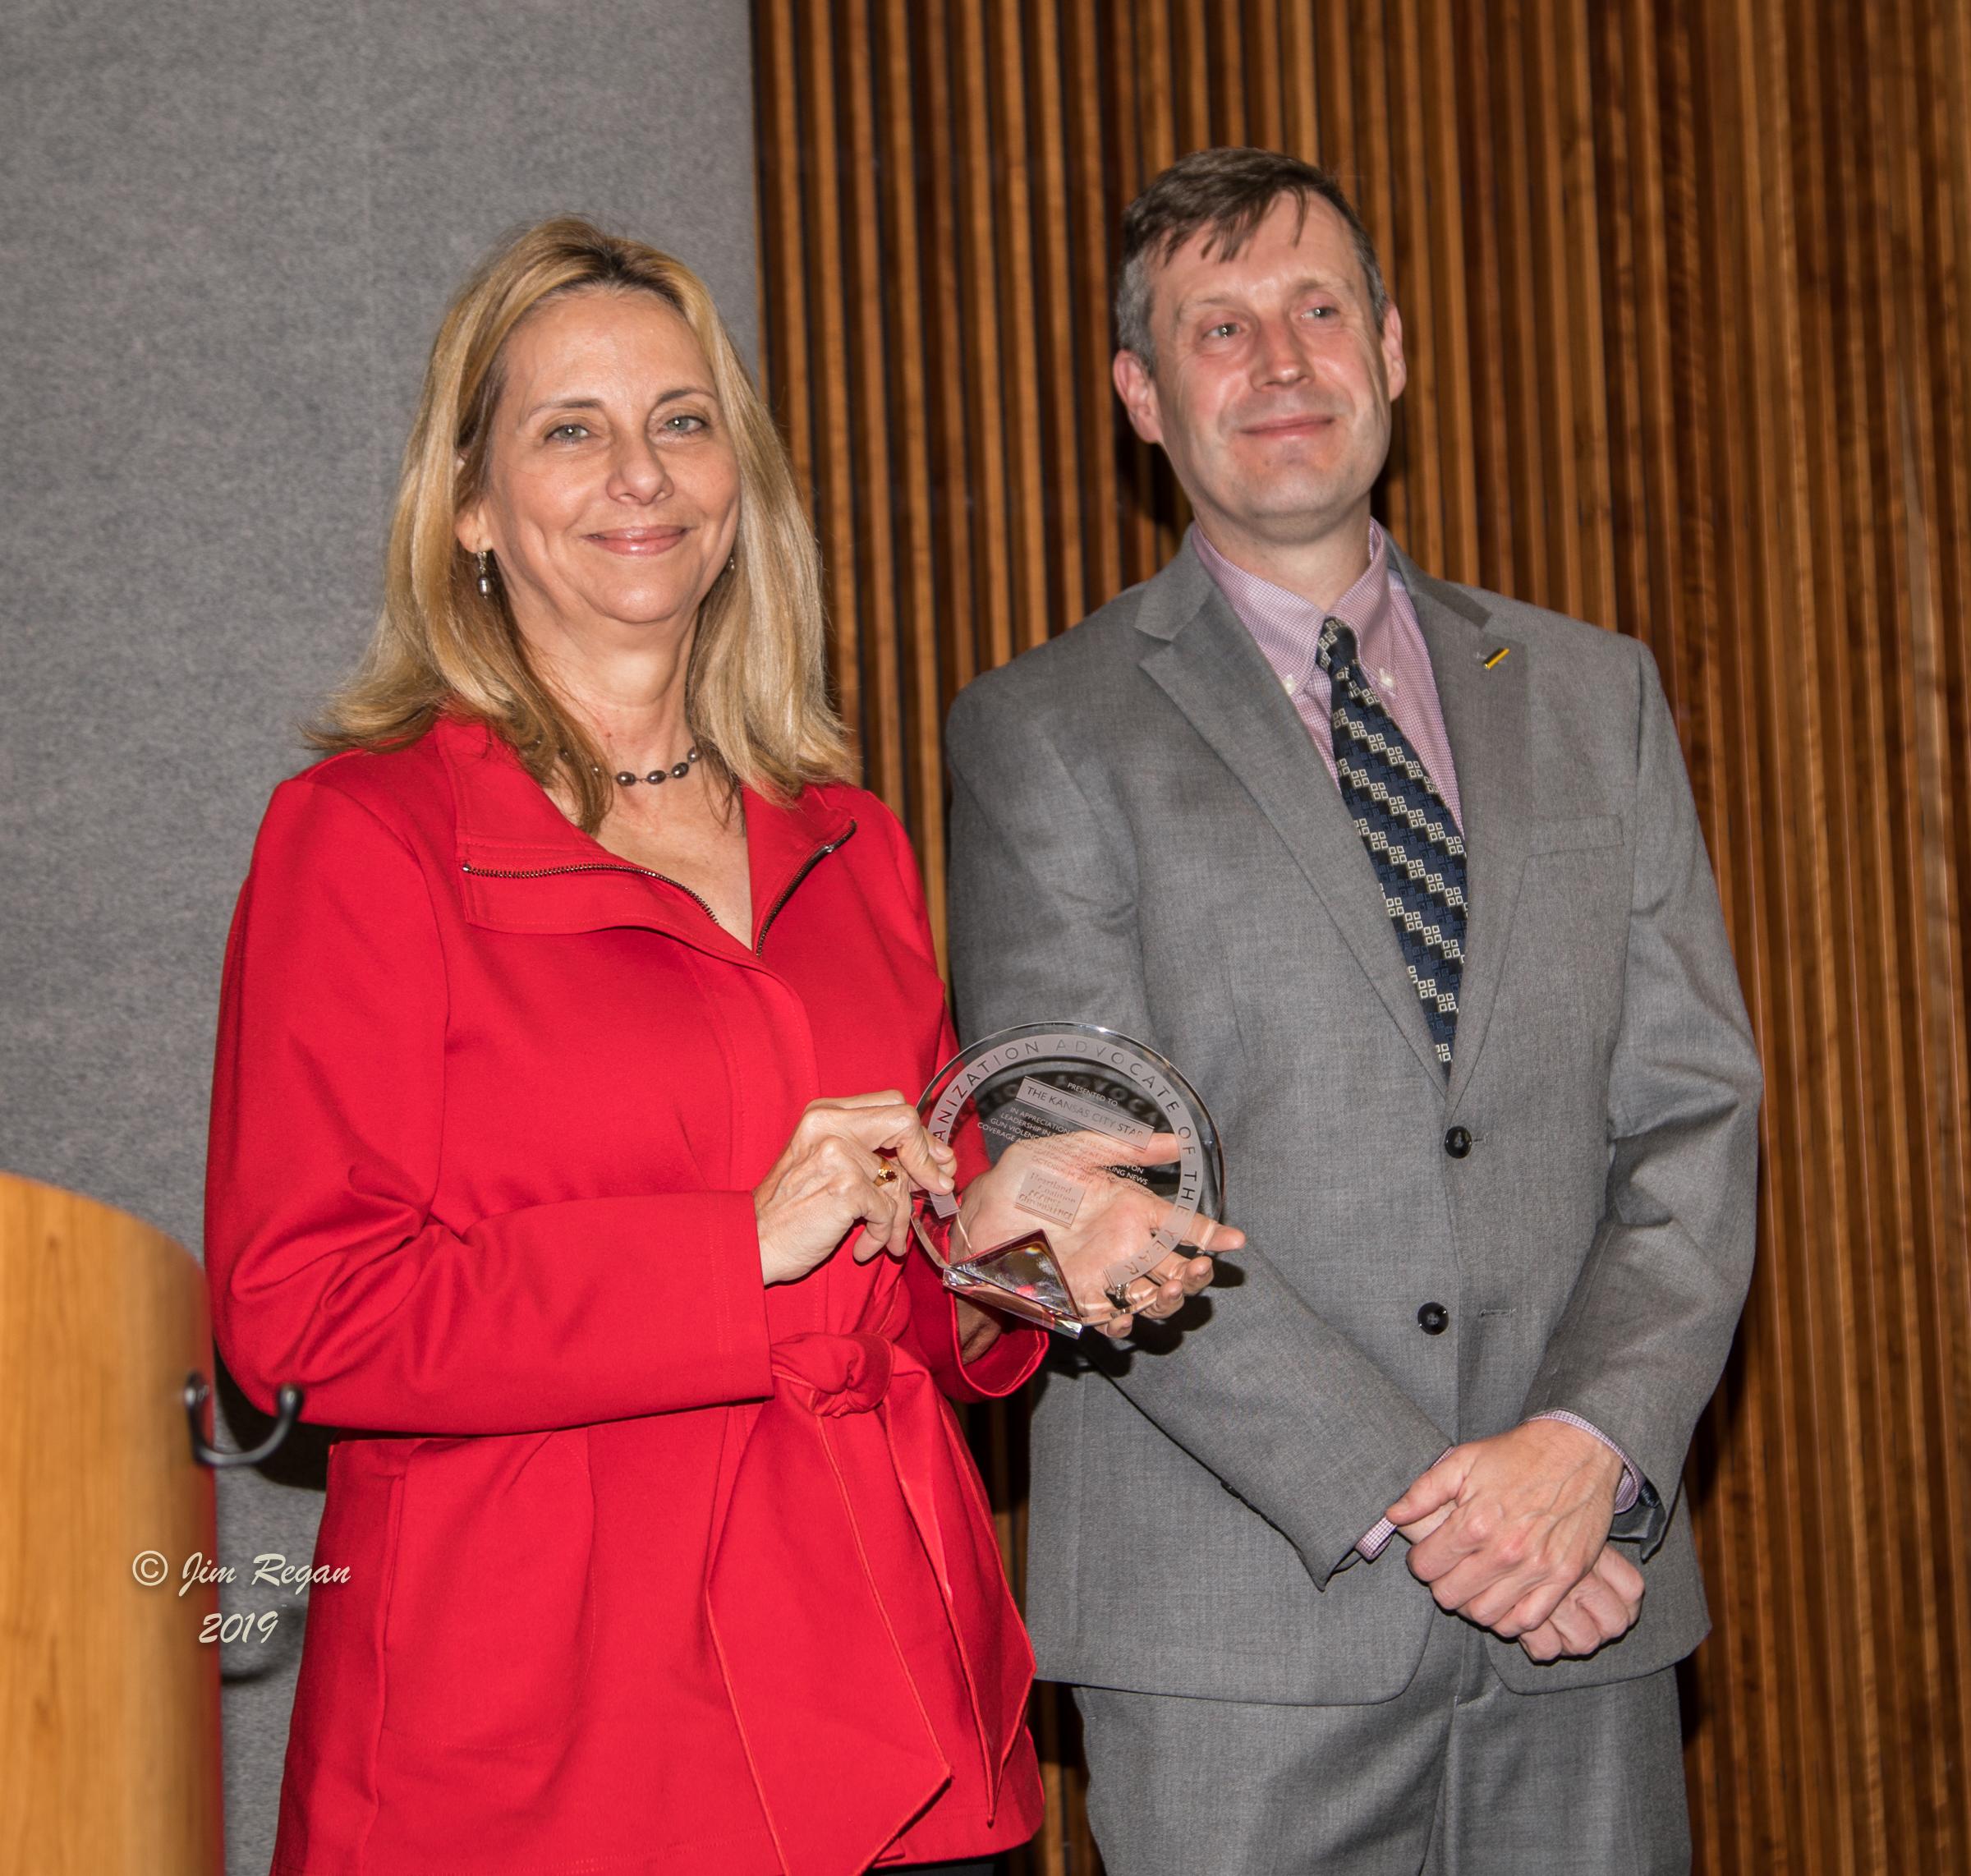 Melinda Henneberger and Derek Donovan for The Kansas City Star Organization Advocates of the year